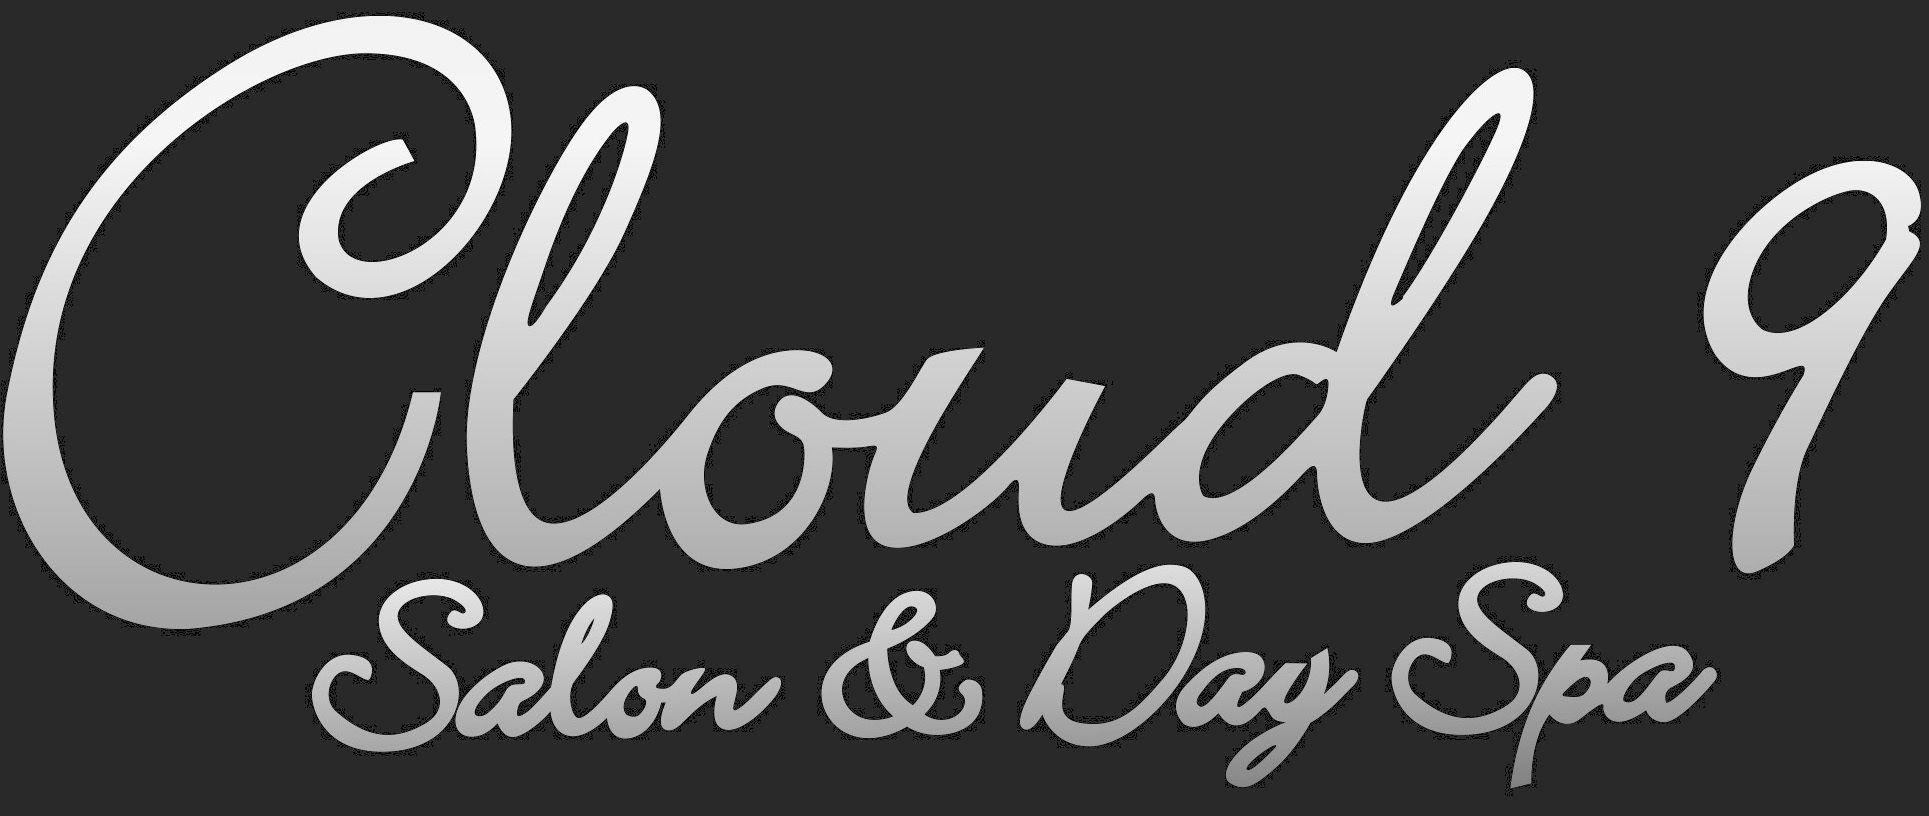 Cloud 9 Salon & Day Spa